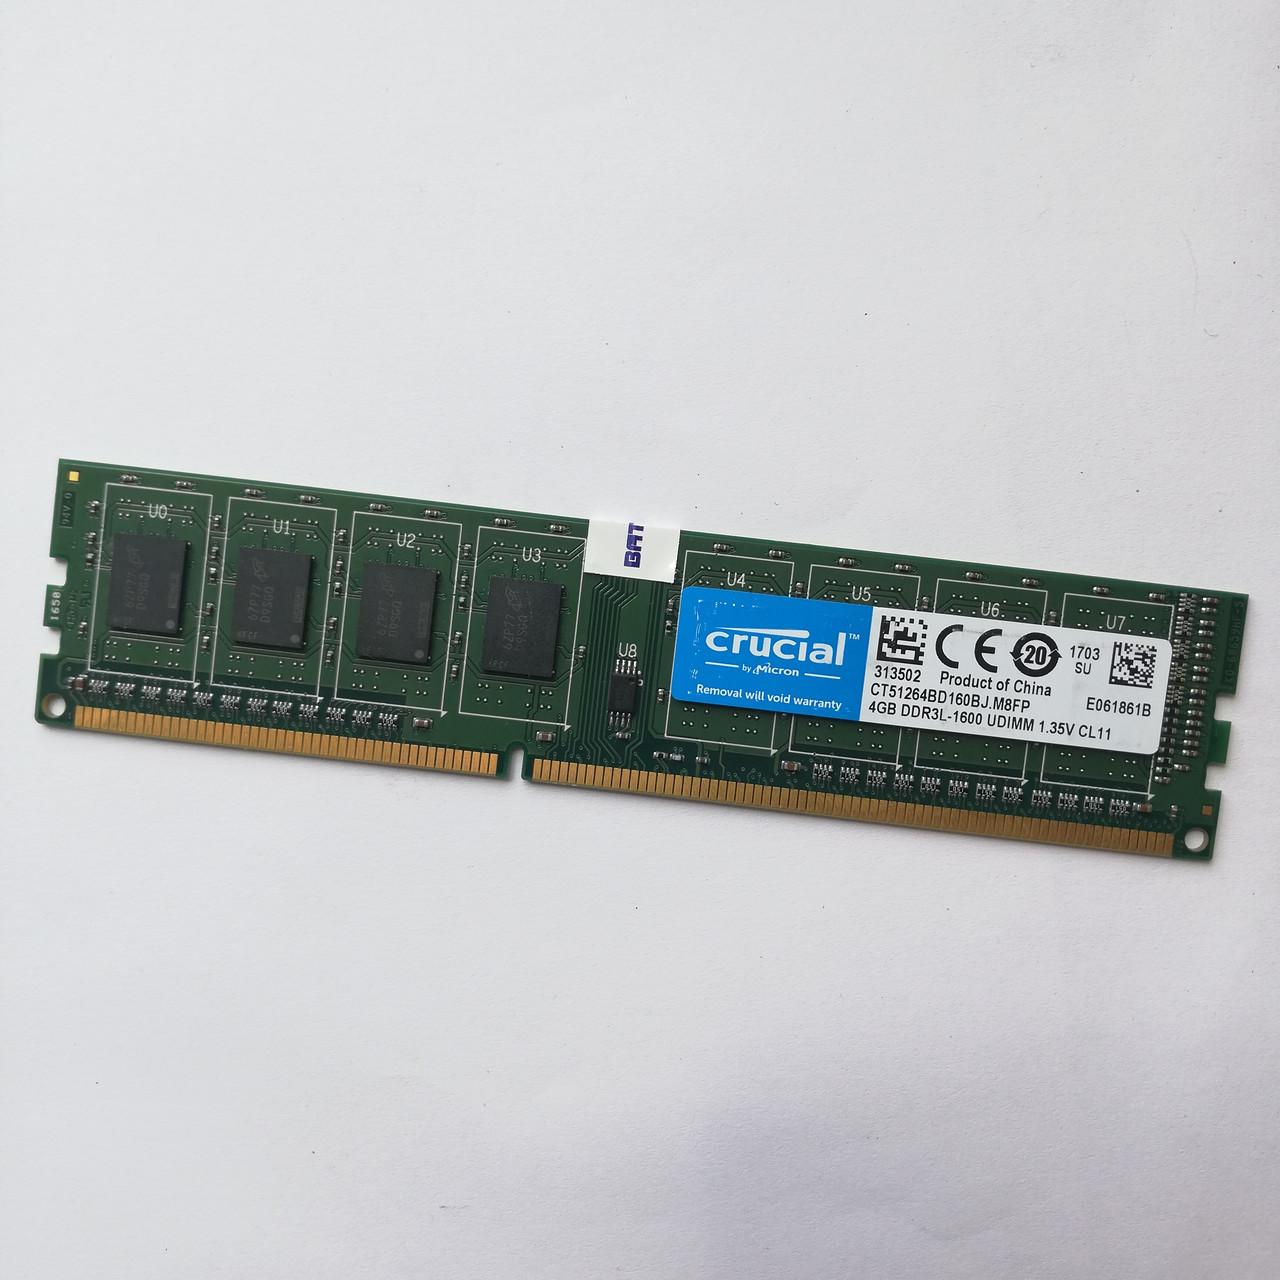 Оперативная память Crucial DDR3L 4Gb 1600MHz PC3L-12800 CL11 (CT51264BD160BJ.M8FP) Б/У